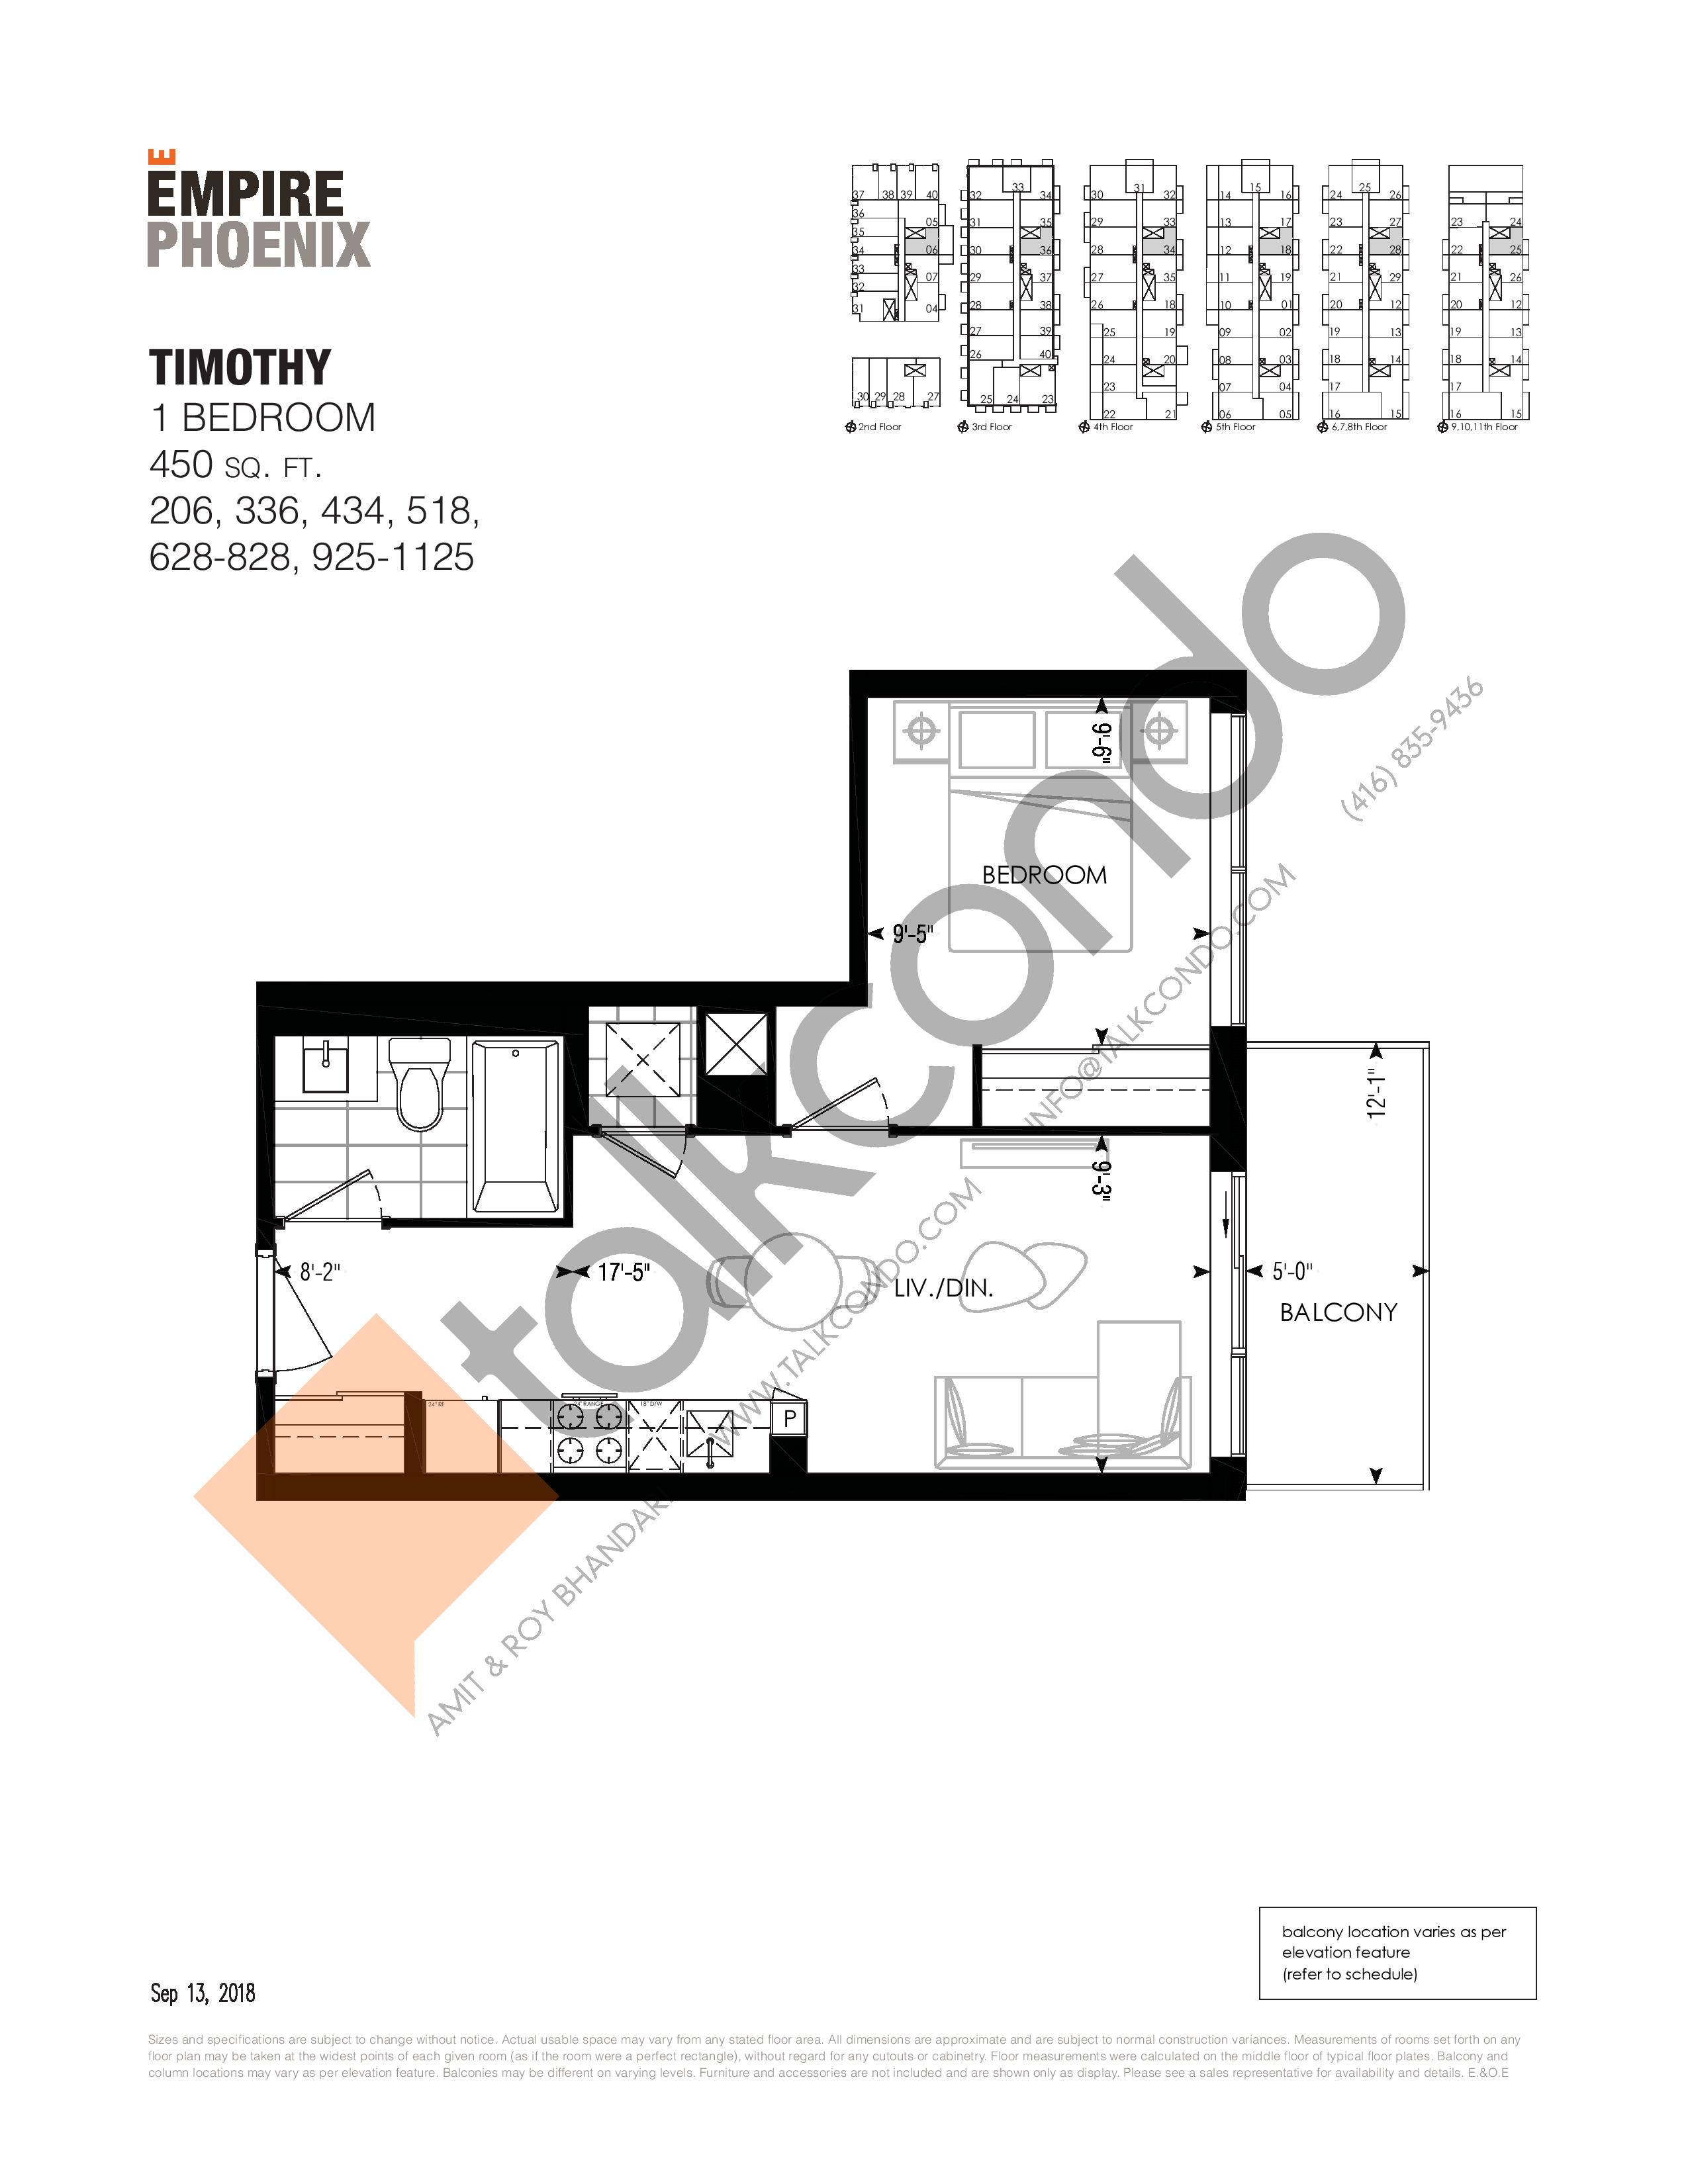 Timothy Floor Plan at Empire Phoenix Phase 2 Condos - 450 sq.ft